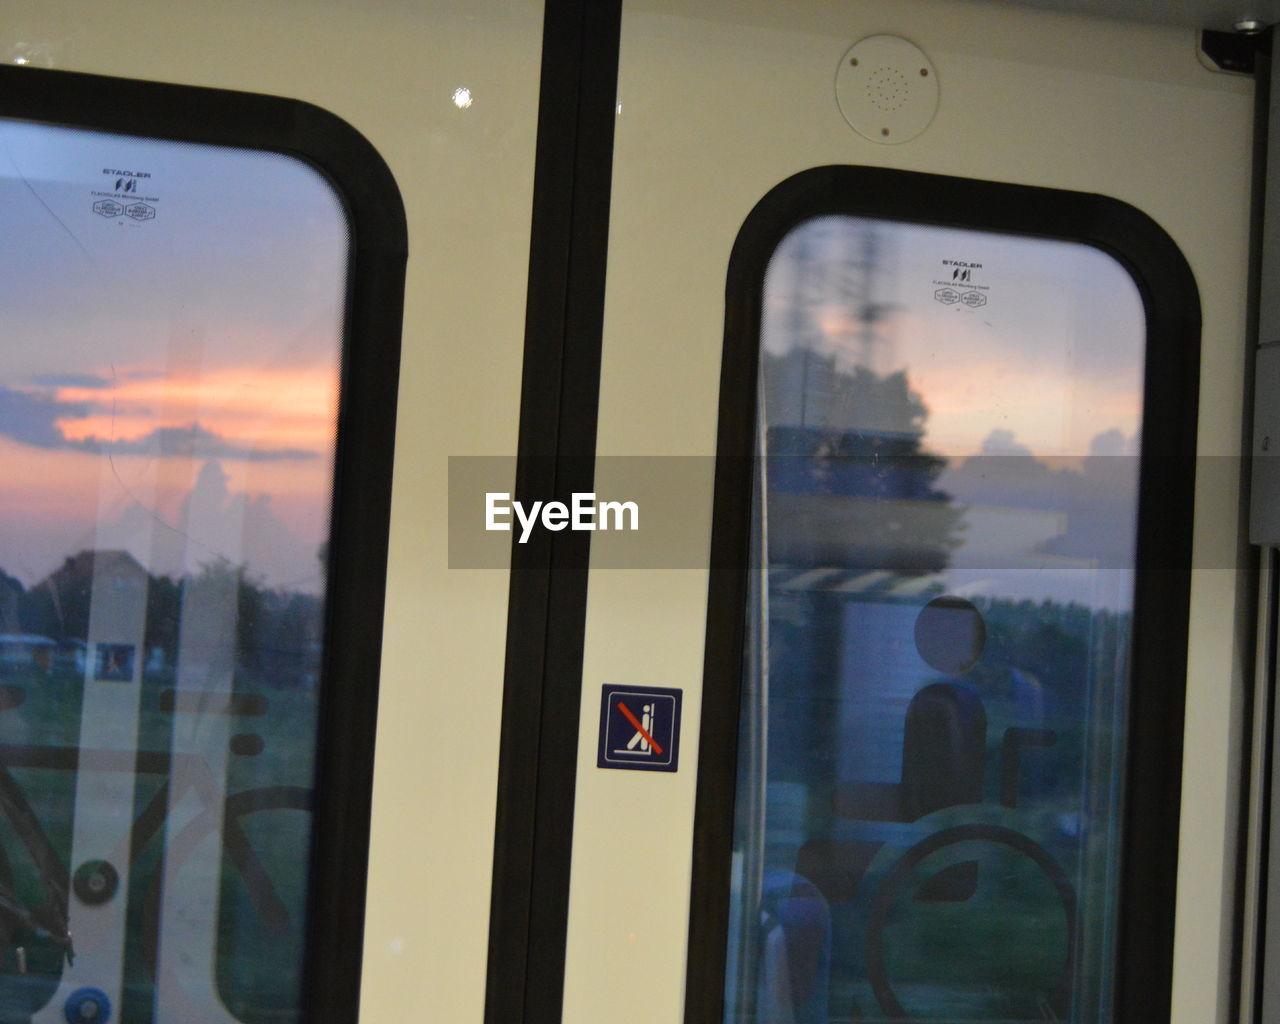 VIEW OF SUNSET SEEN THROUGH TRAIN WINDOW